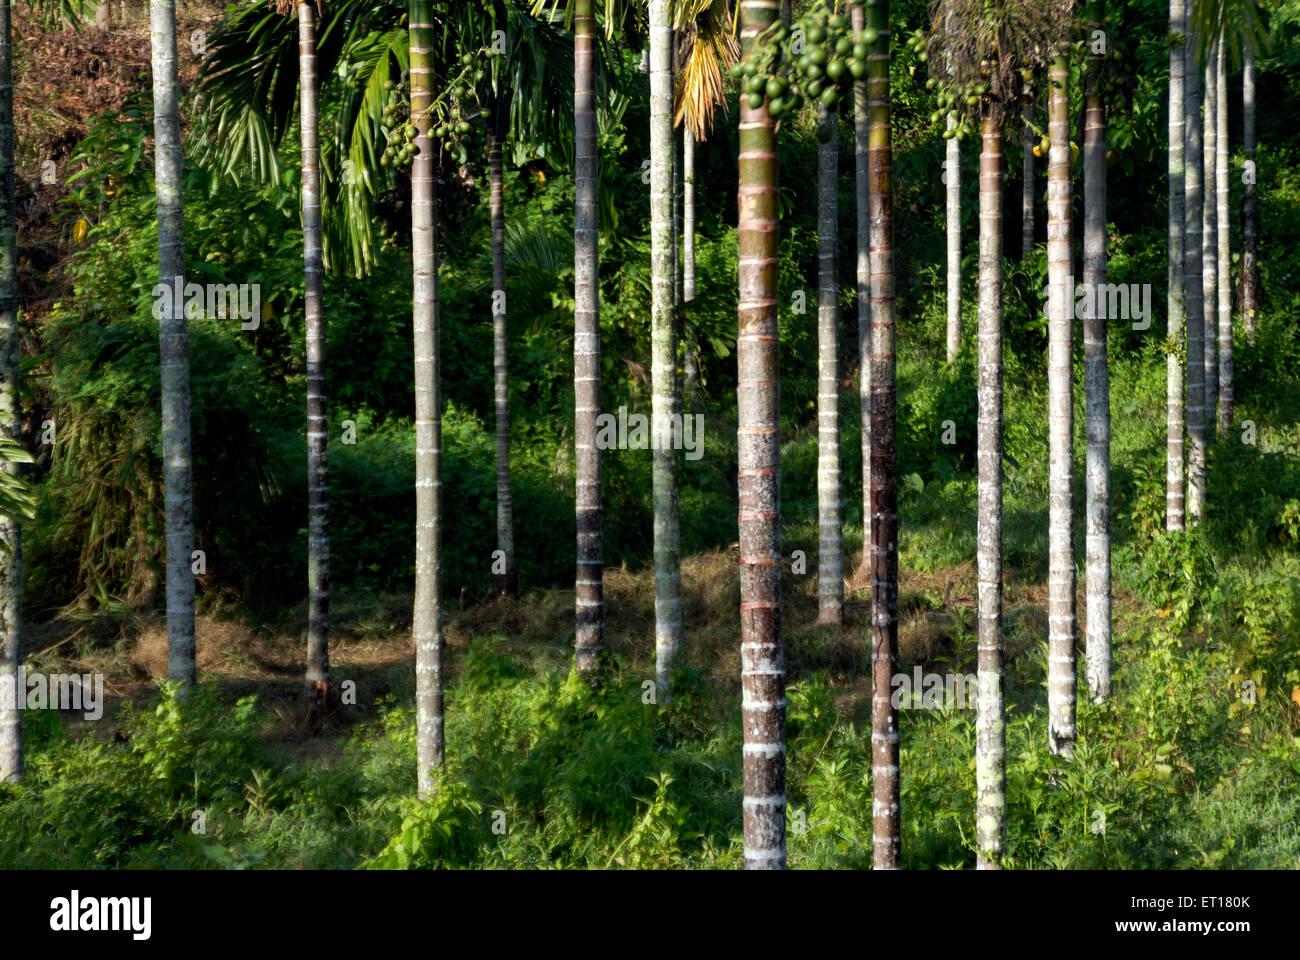 Betel nut areca nut ; Port Blair ; South Andaman Islands ; Bay of Bengal ; India October 2008 - Stock Image